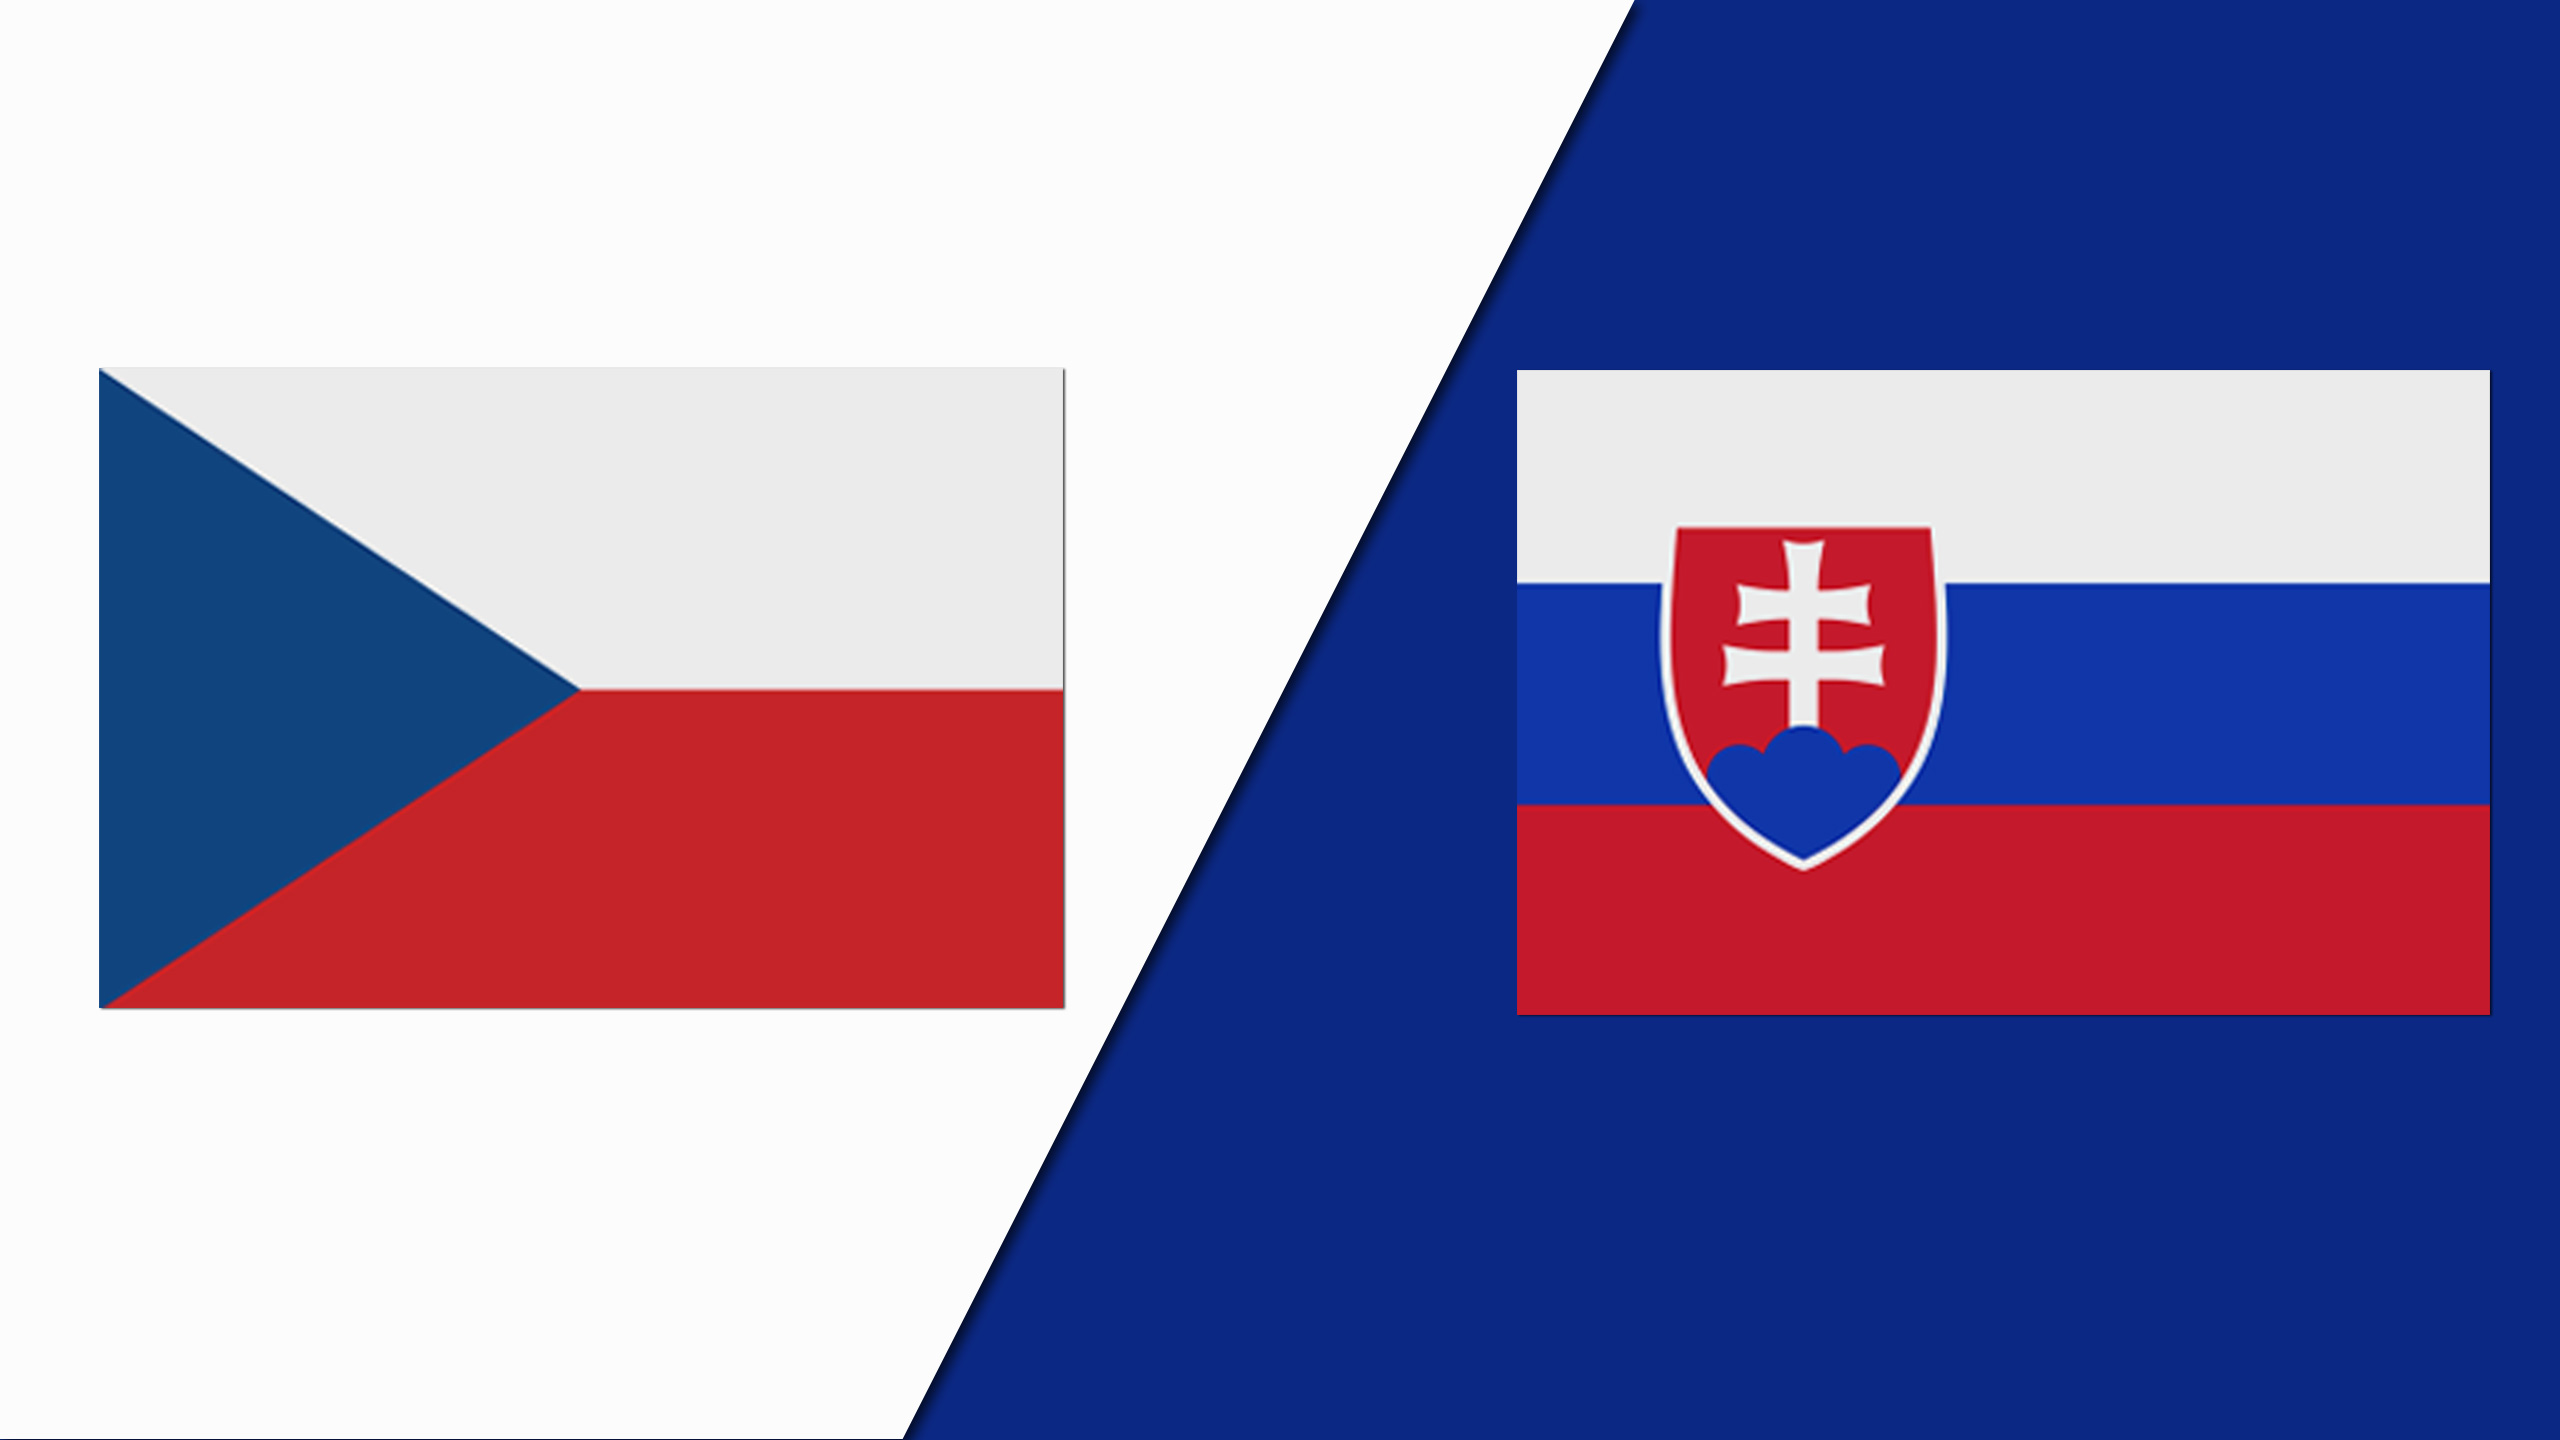 Czech Republic vs. Slovakia